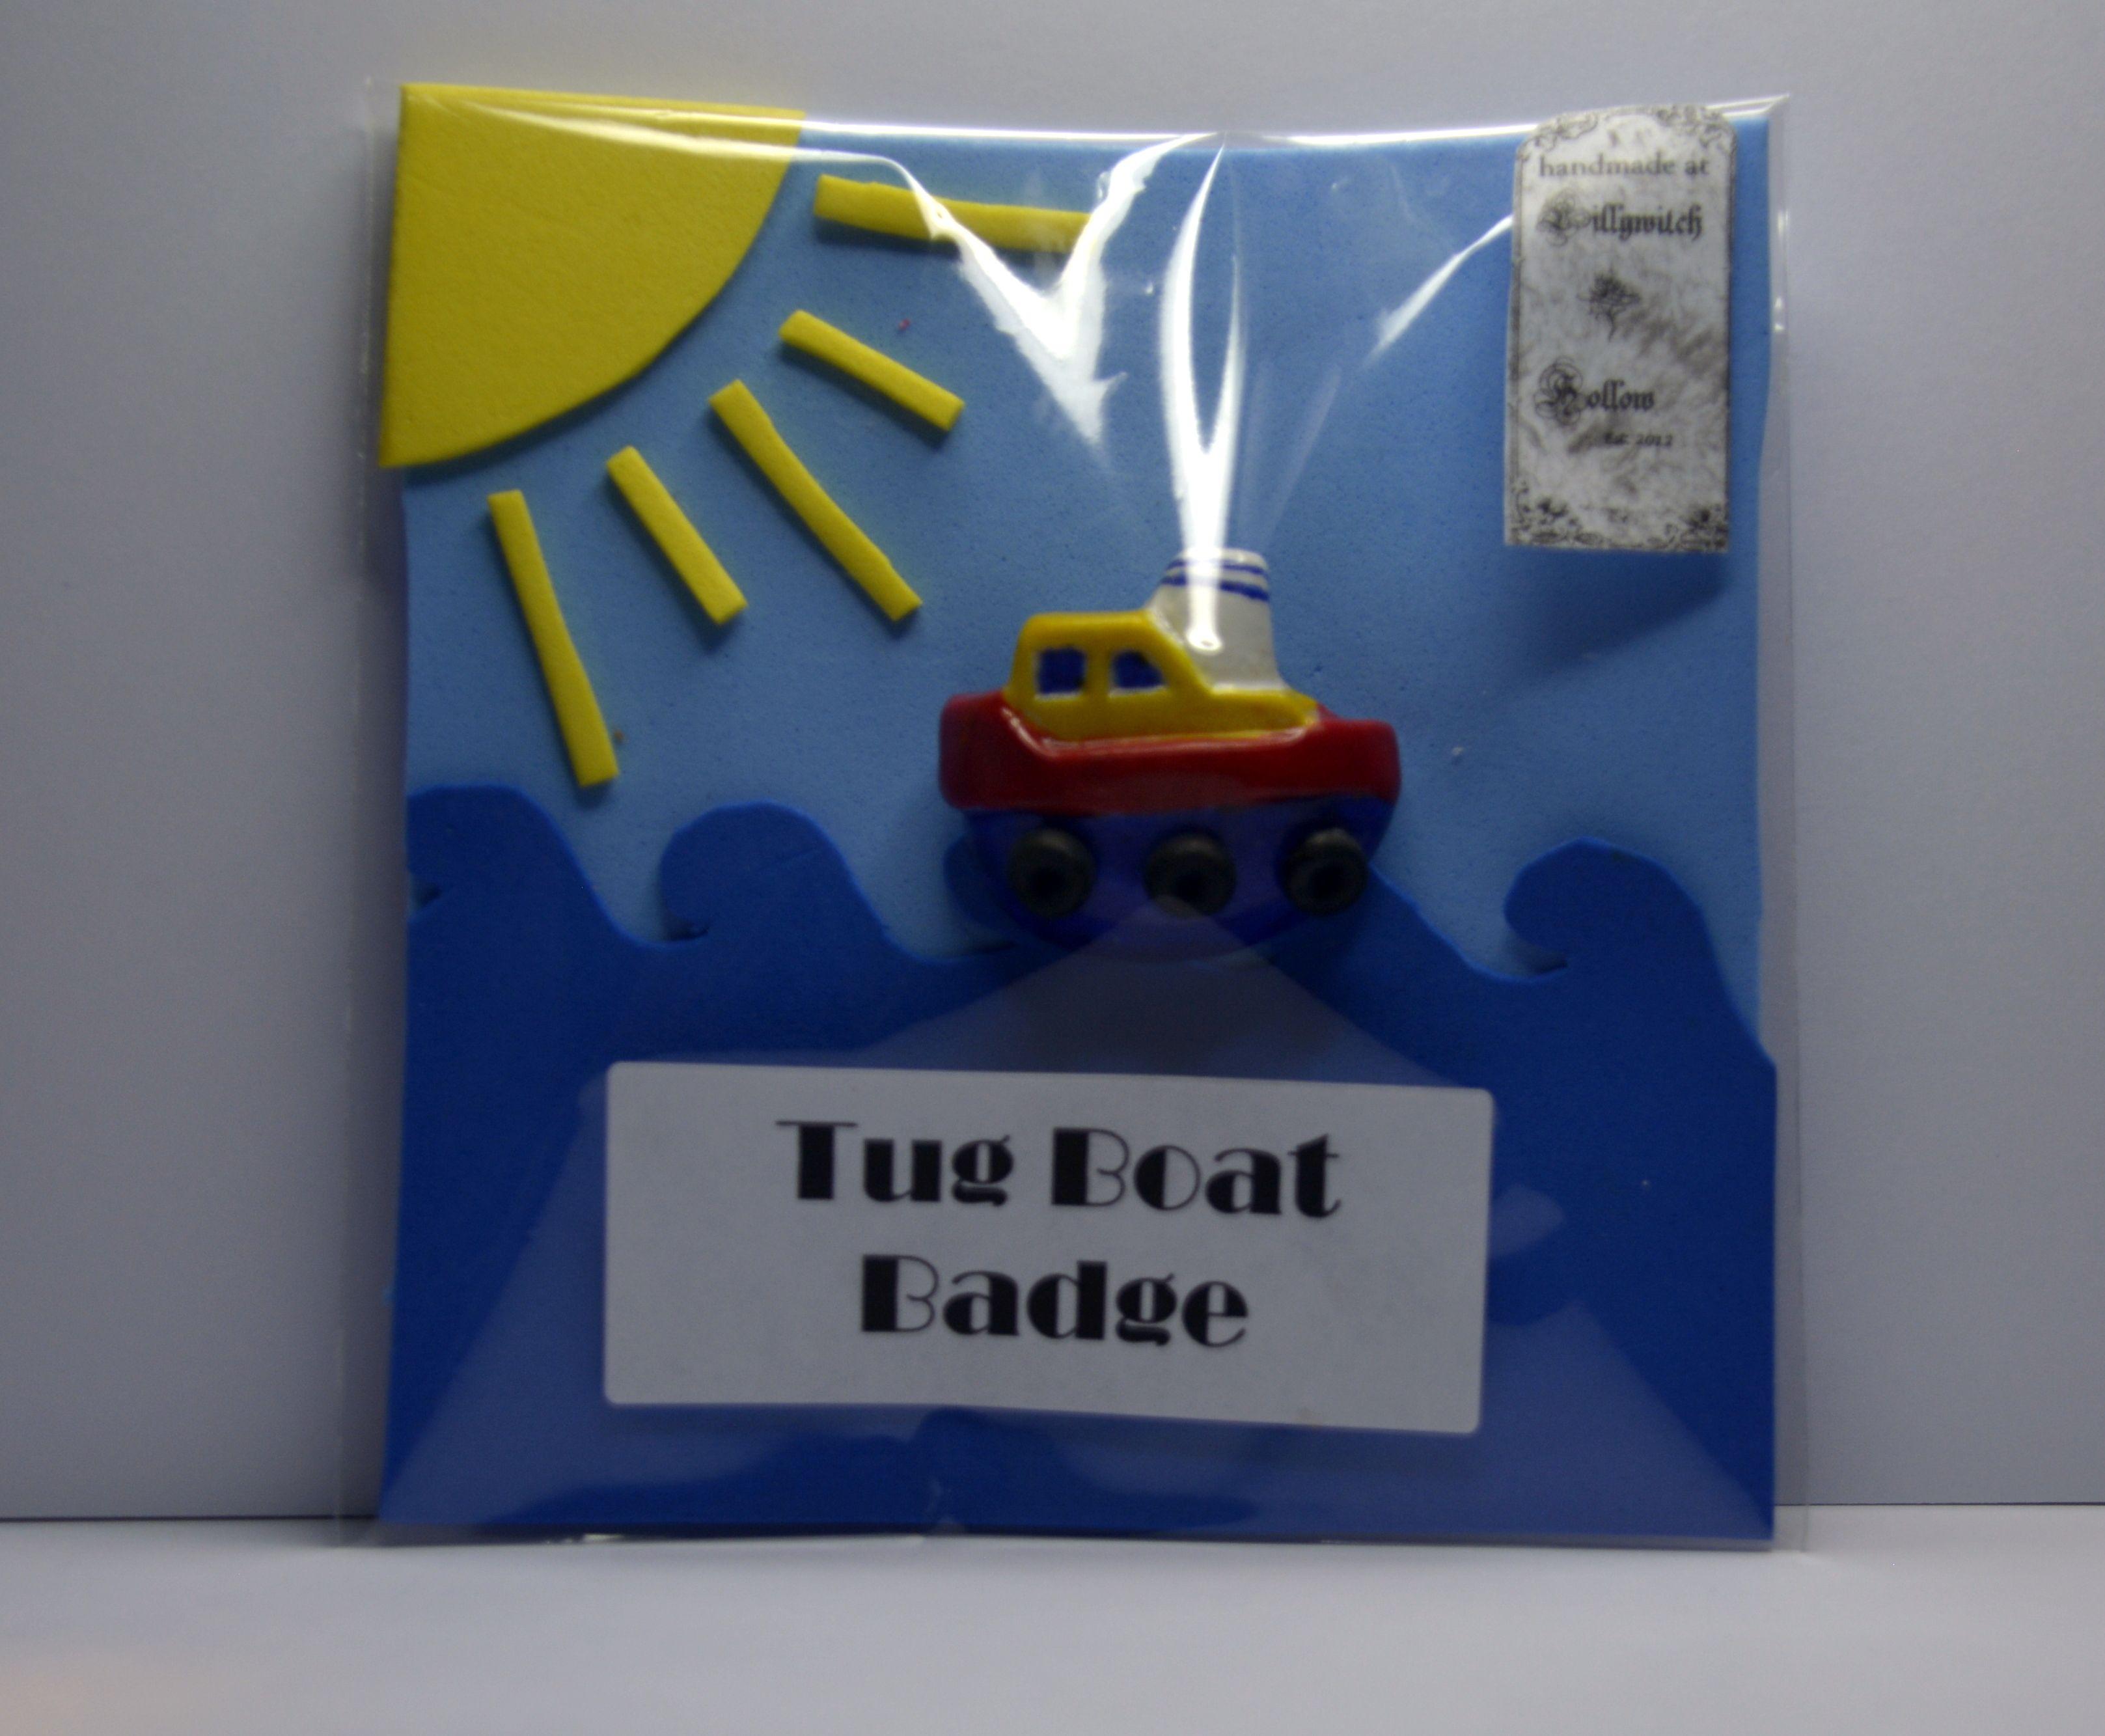 Tug Boat Badge https://www.etsy.com/au/shop/LillywitchHollow